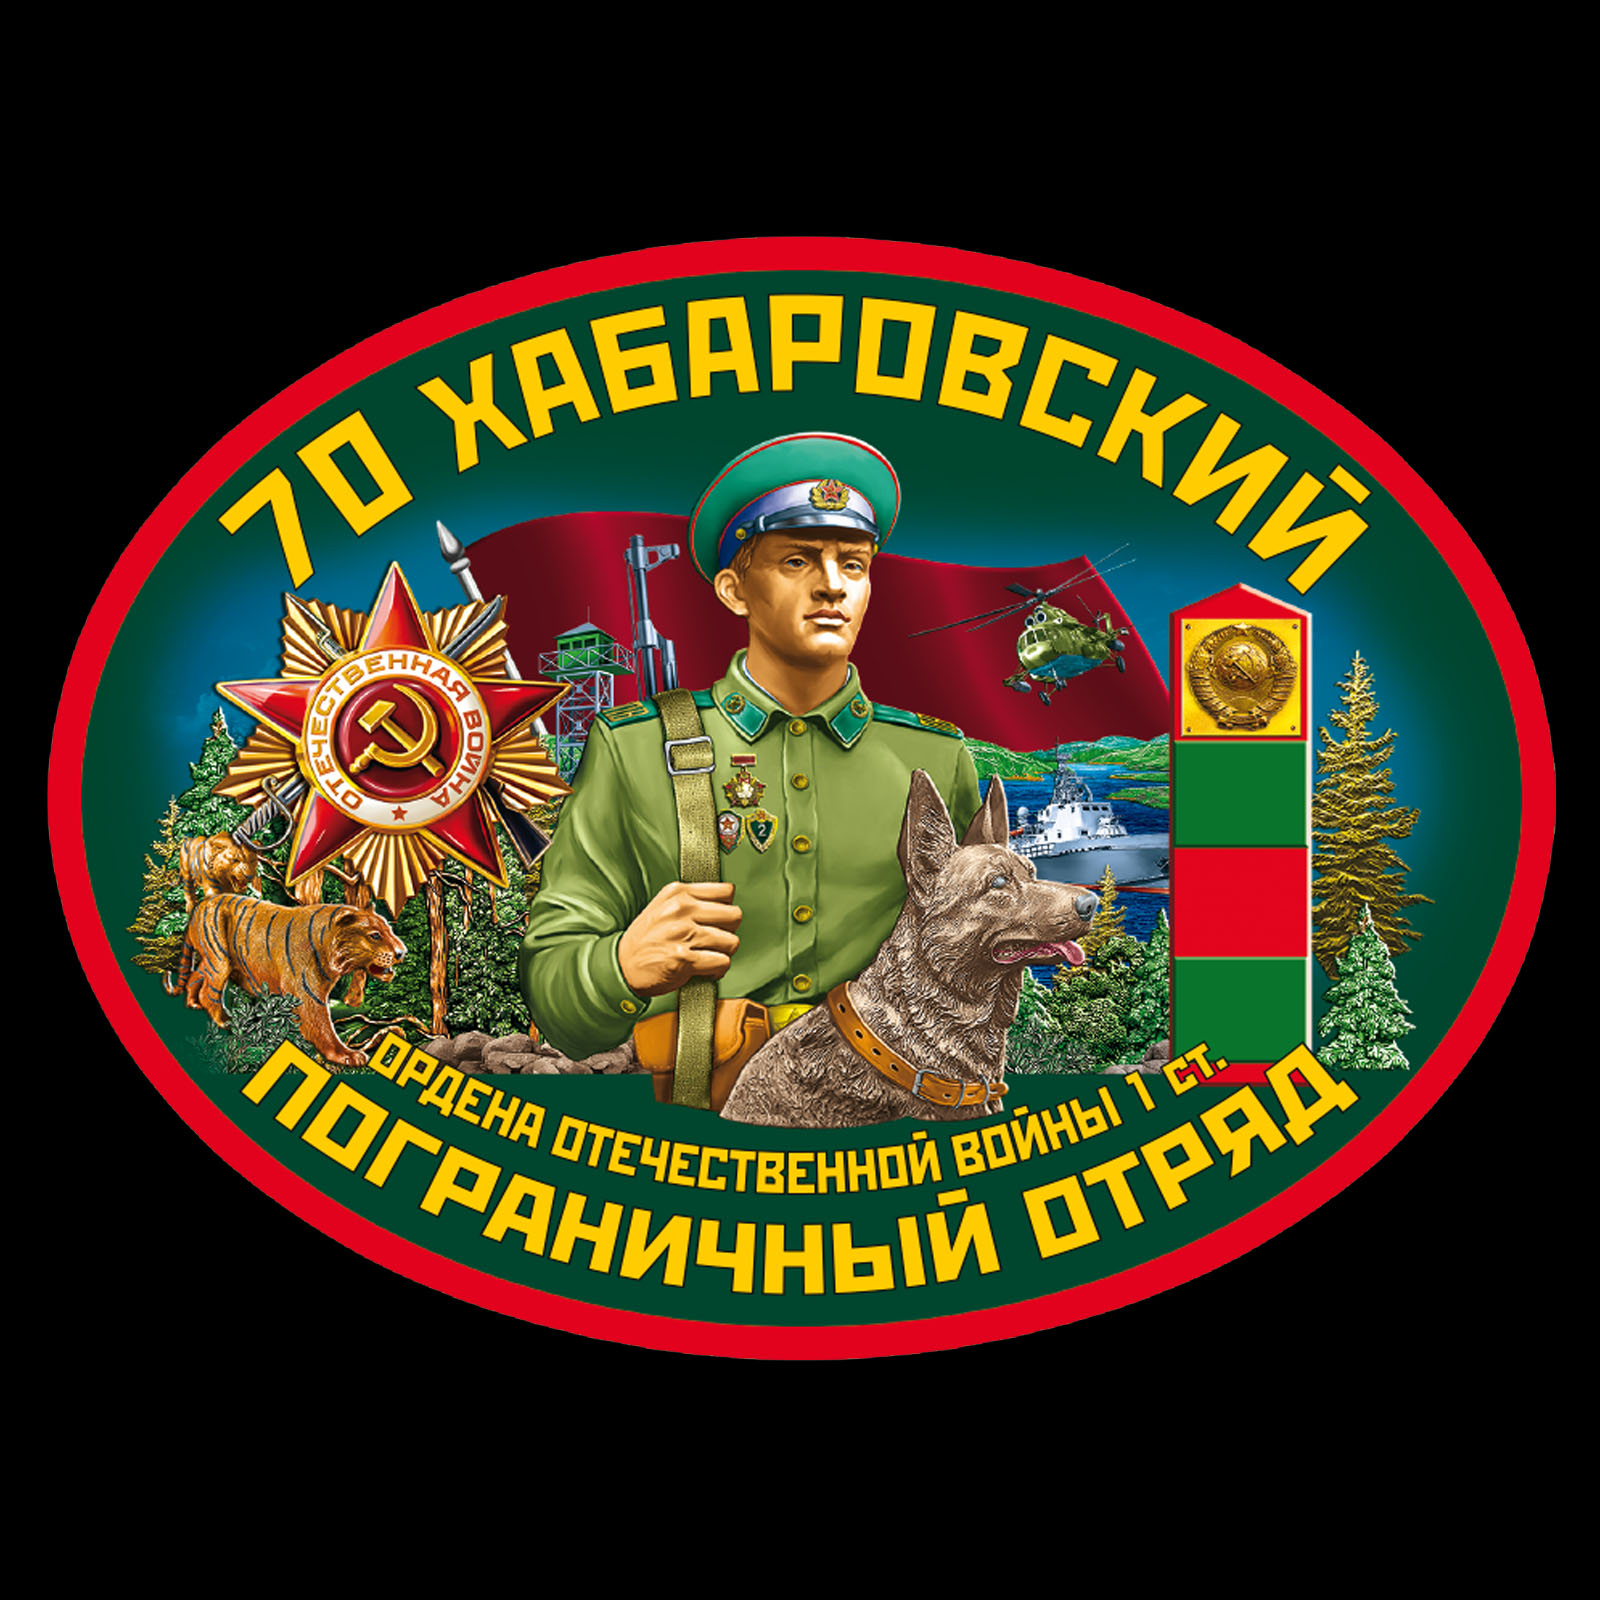 Футболка 70-го Хабаровского погранотряда